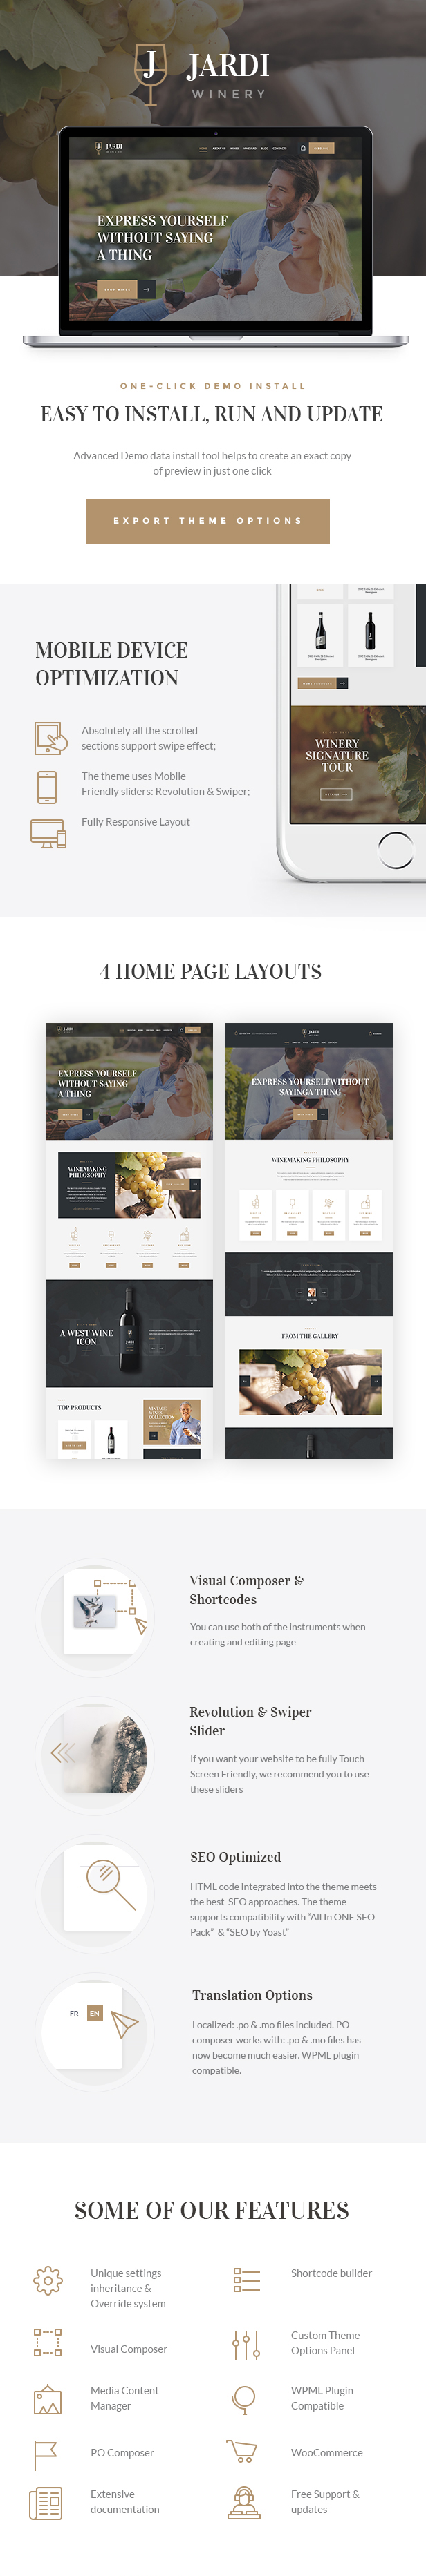 Winery, Vineyard & Wine Shop WordPress Theme features